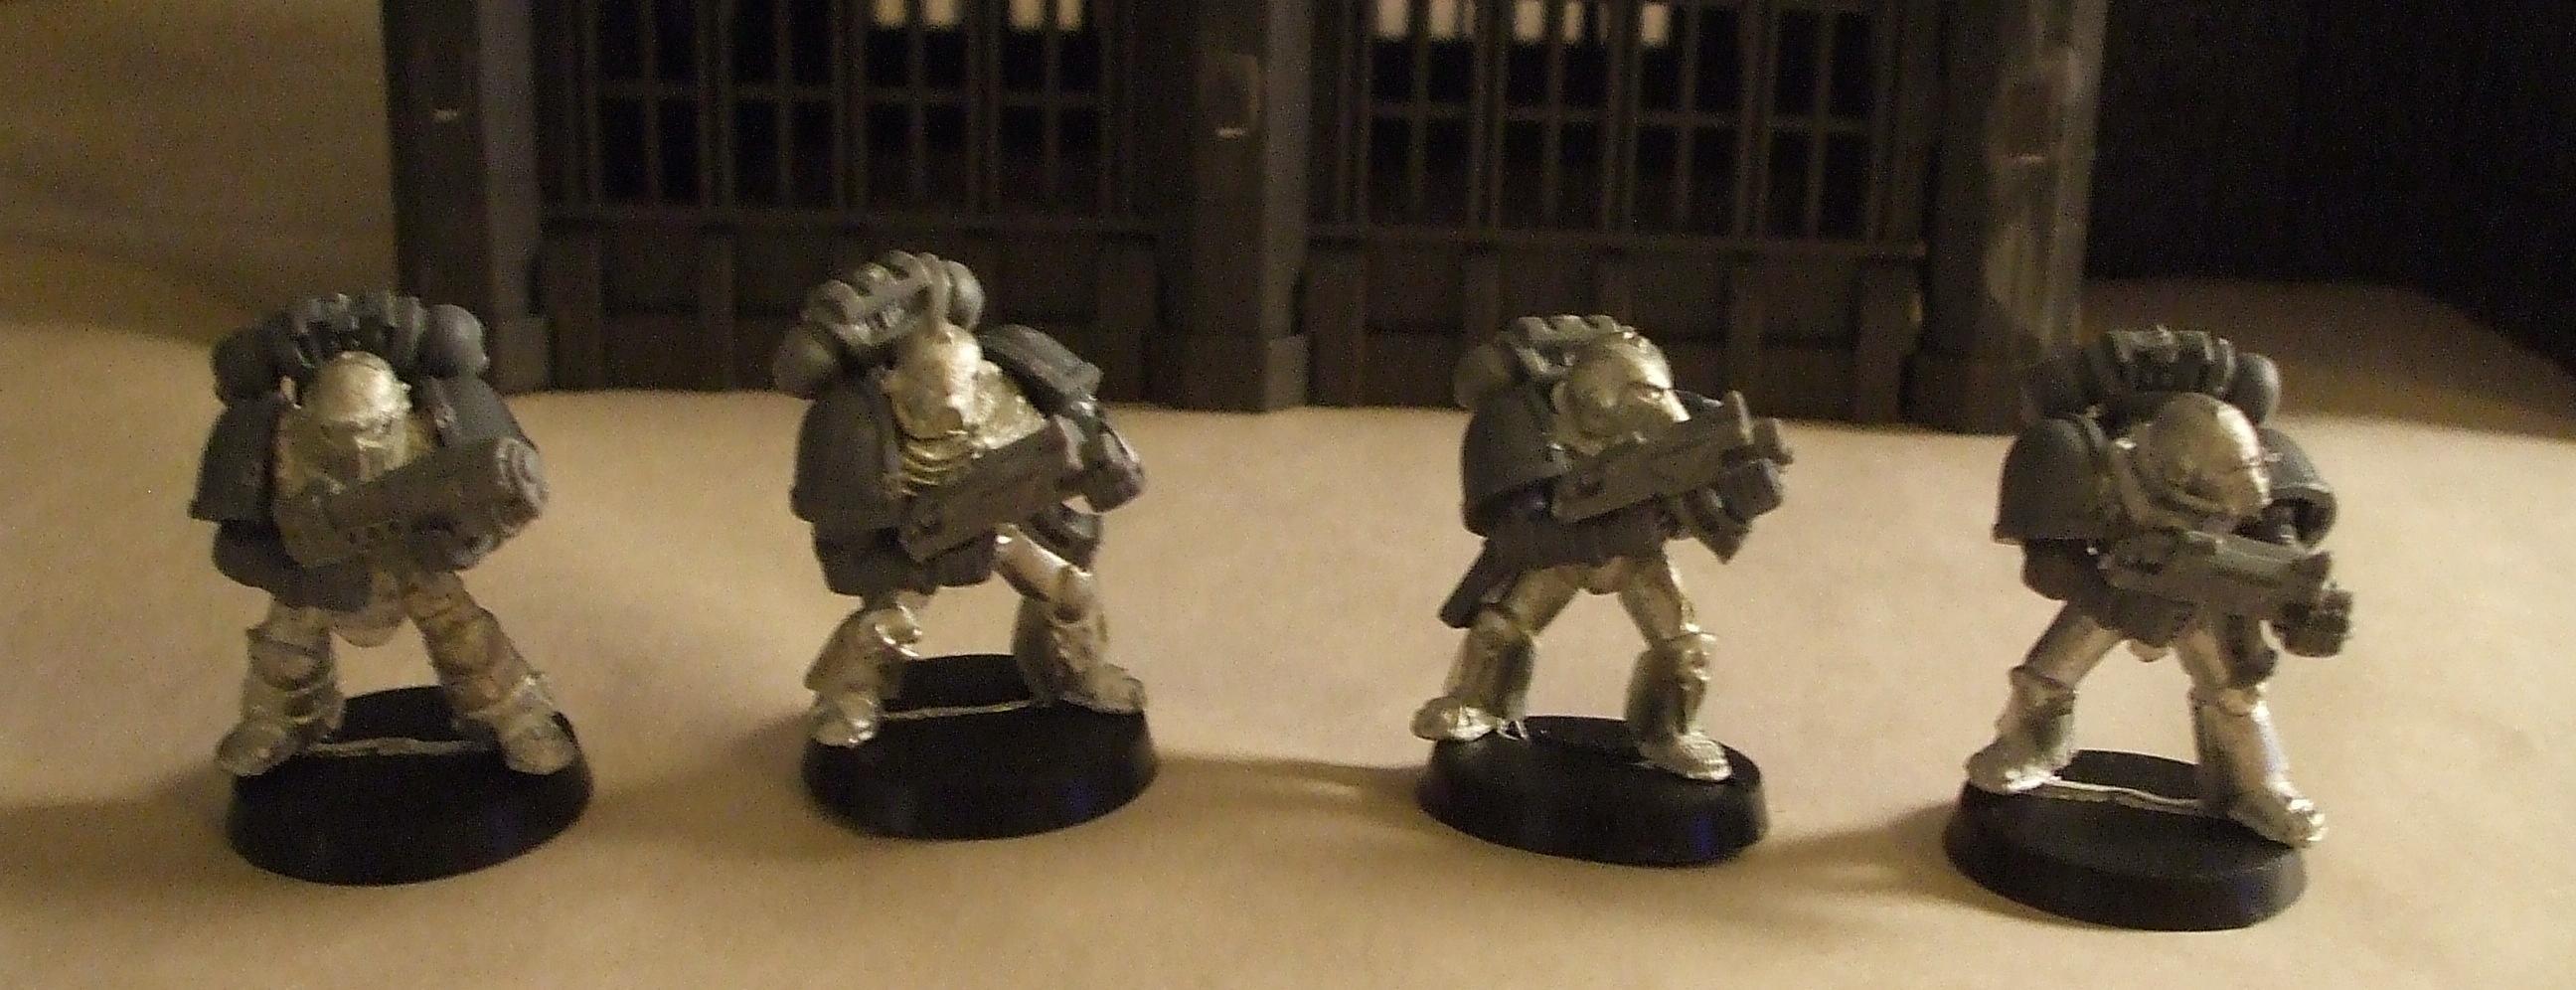 Rogue Trader, Space Marines, Variant Armor, Warhammer 40,000, Work In Progress